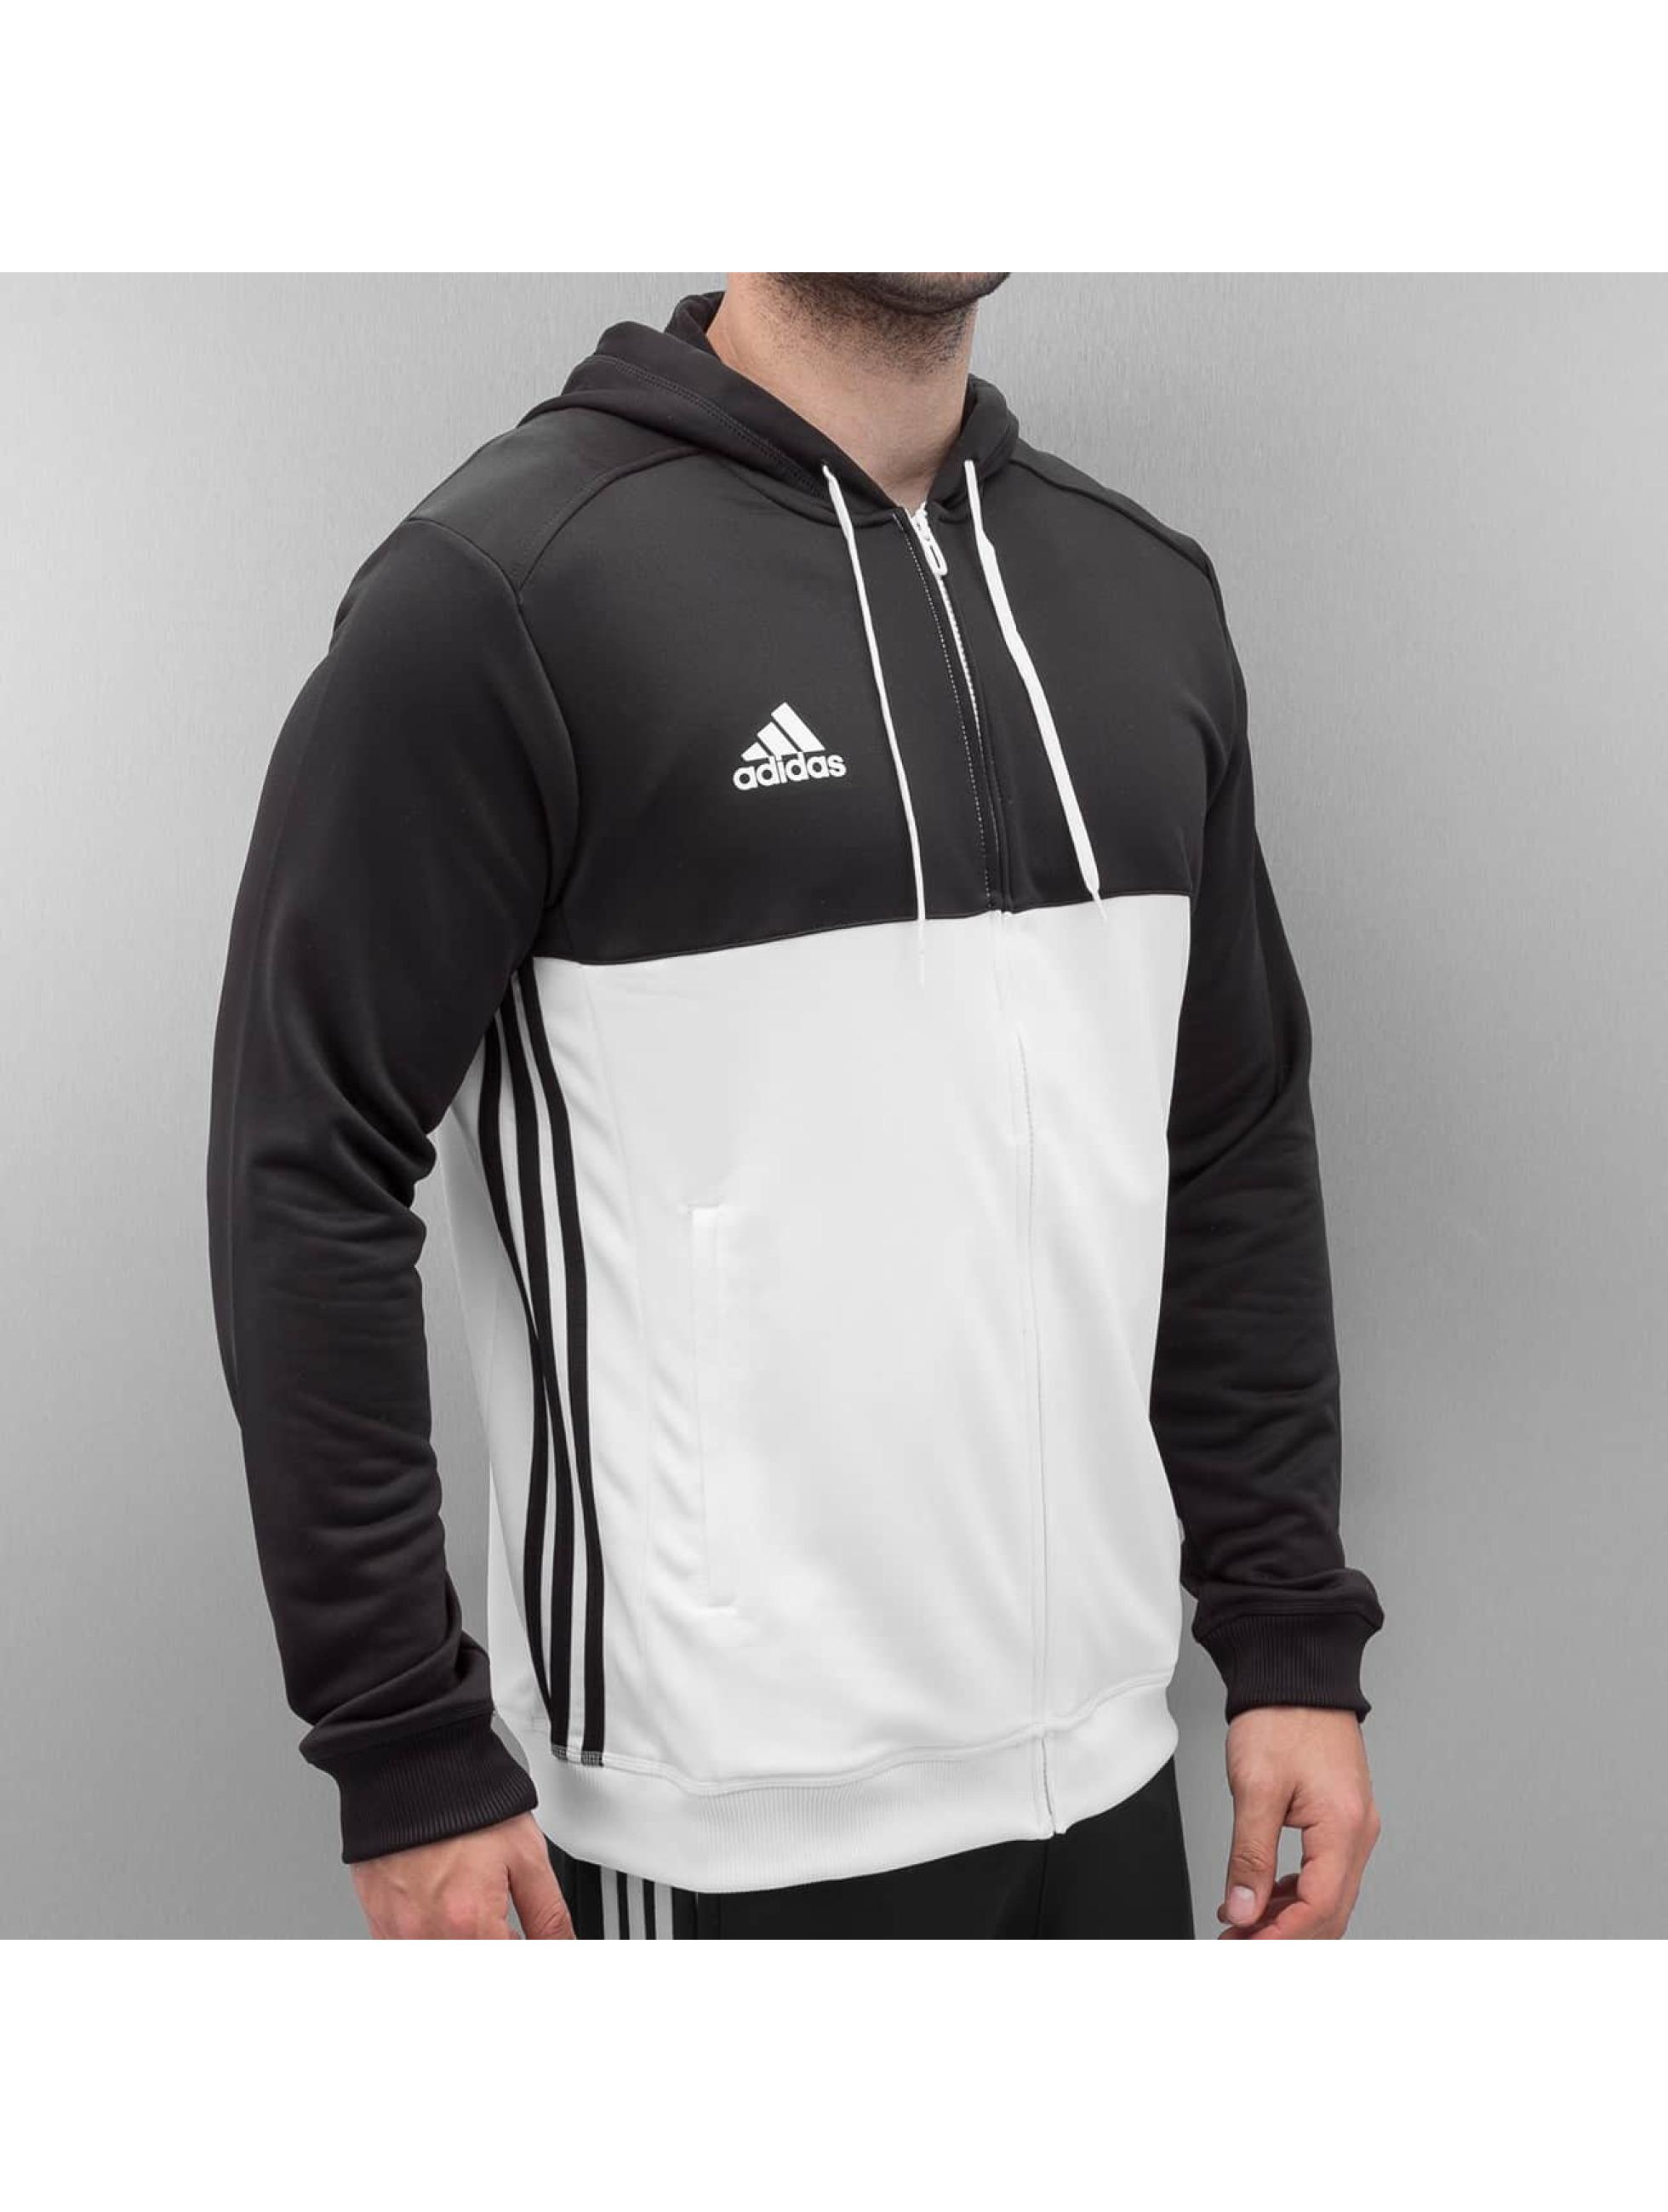 adidas Boxing MMA Lightweight Jacket T16 Hooded black